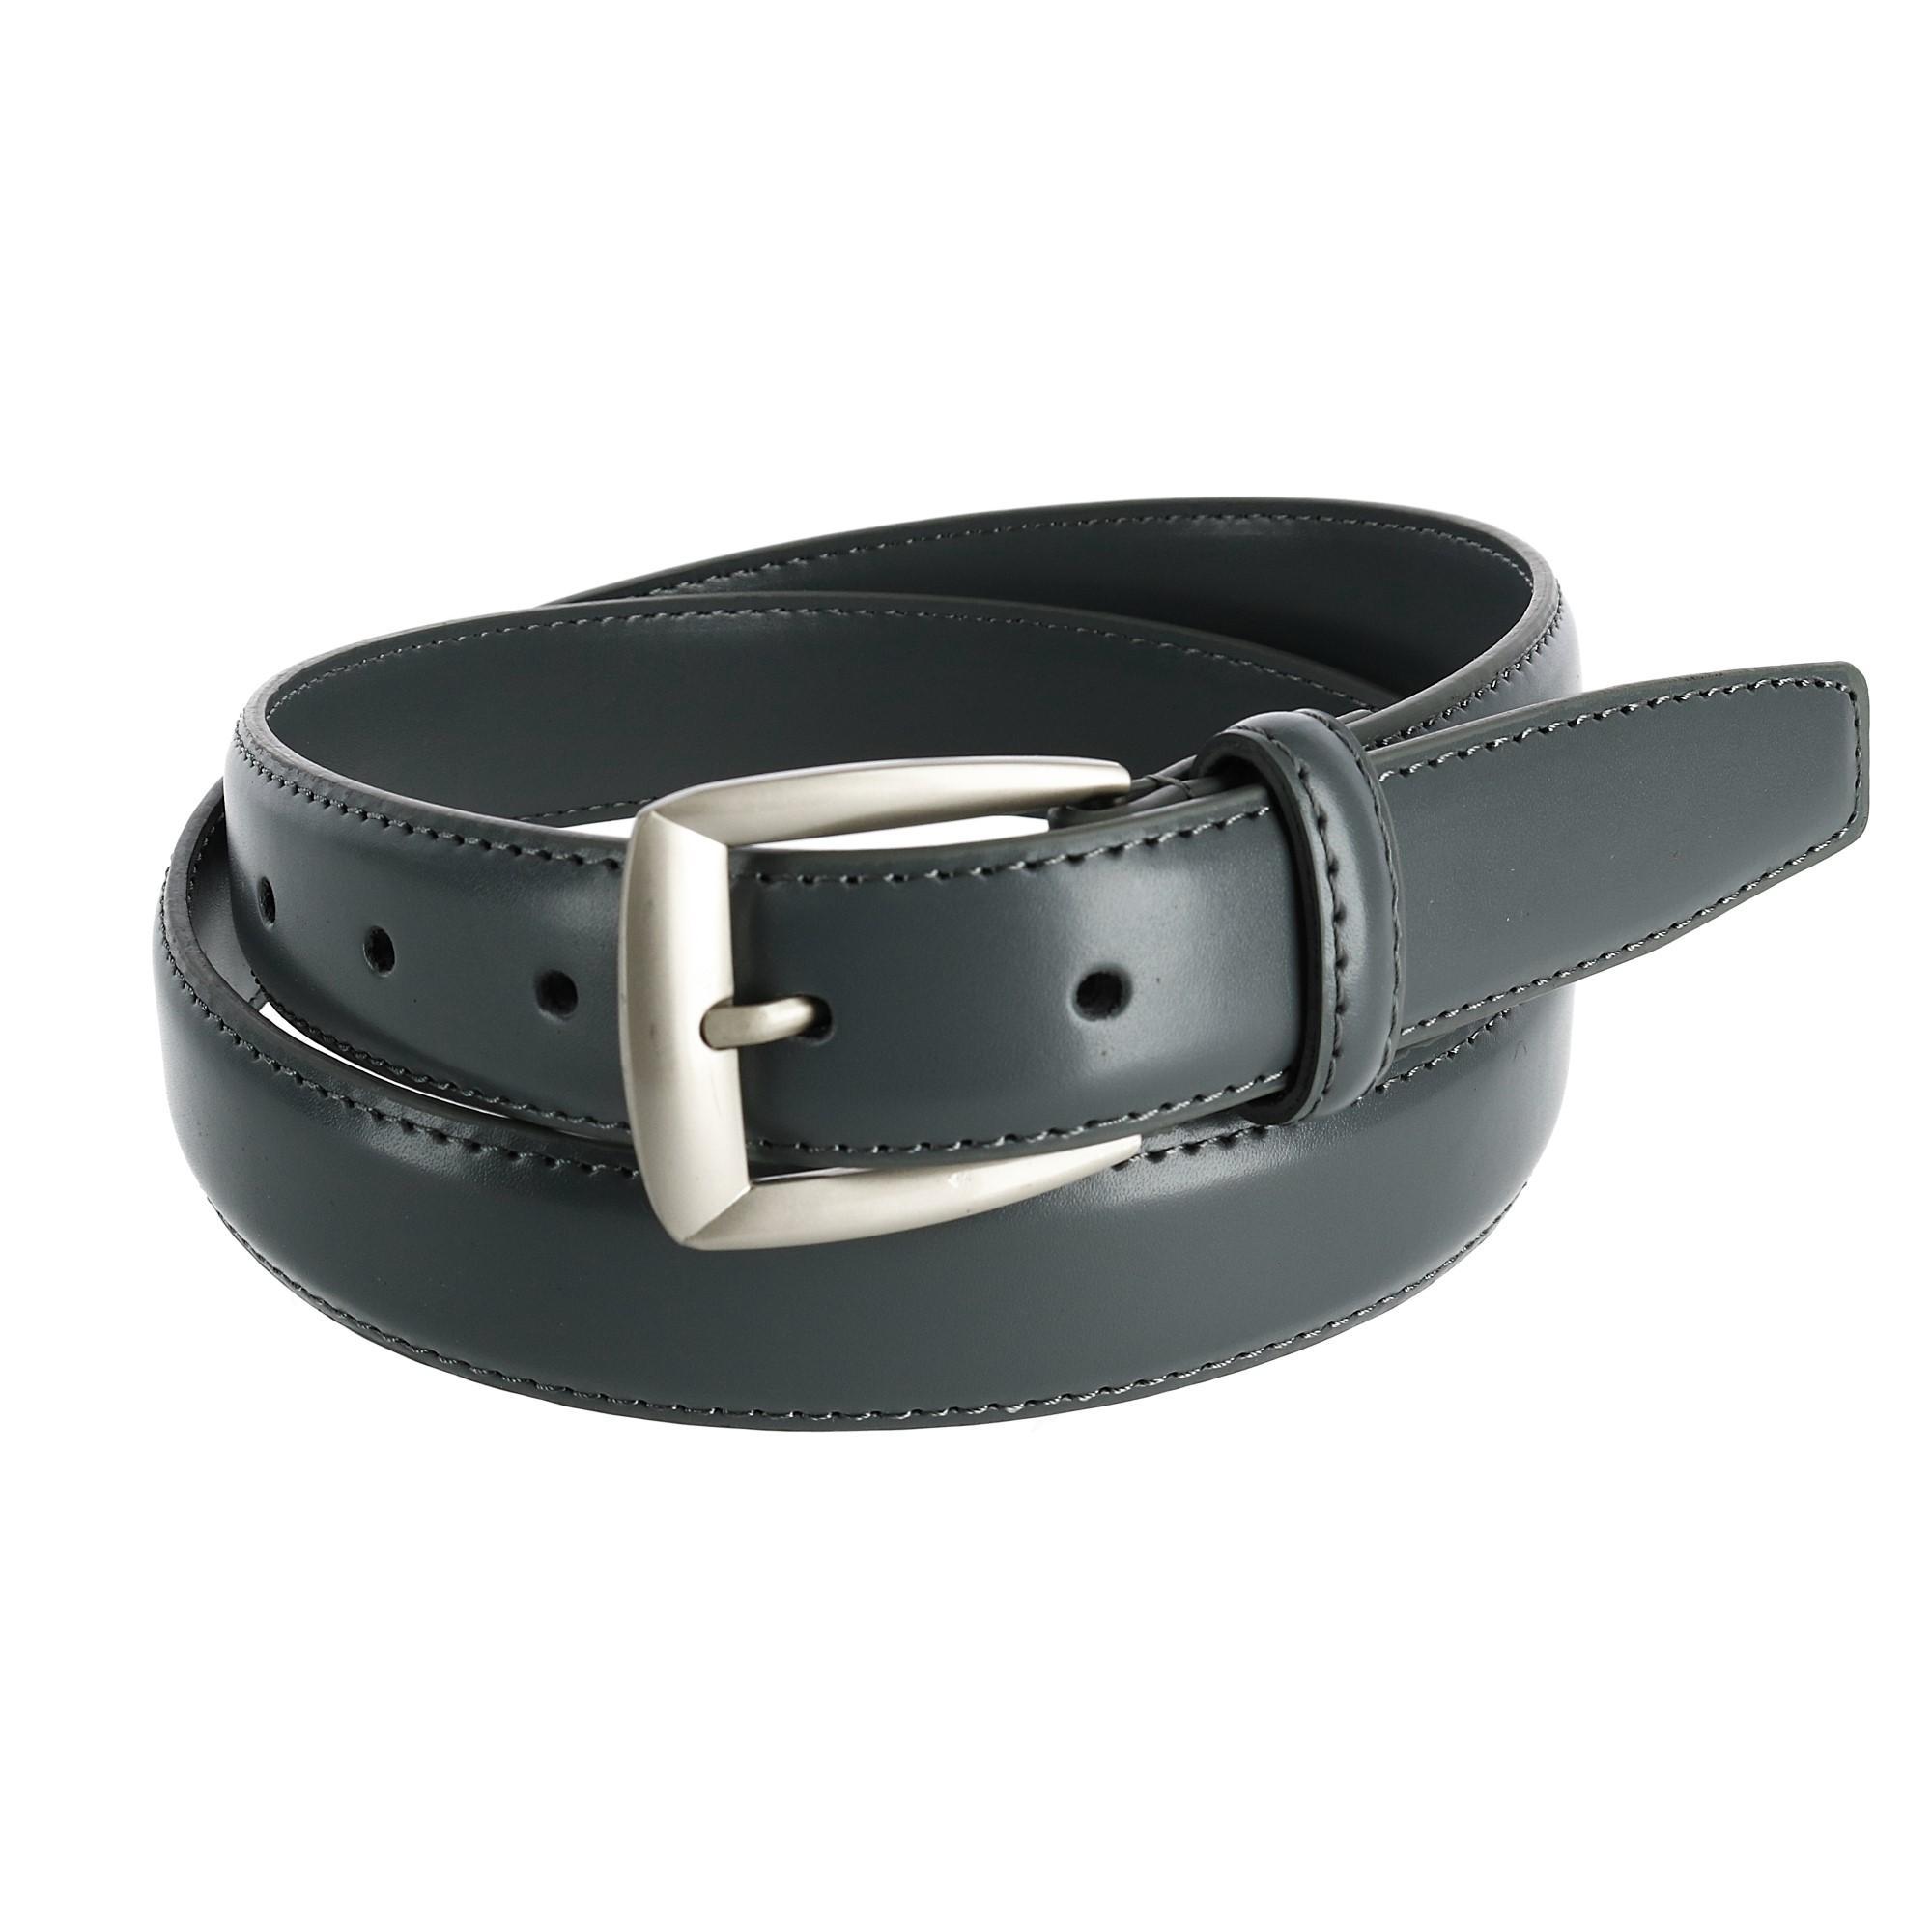 new ctm s leather 1 1 4 inch basic dress belt ebay